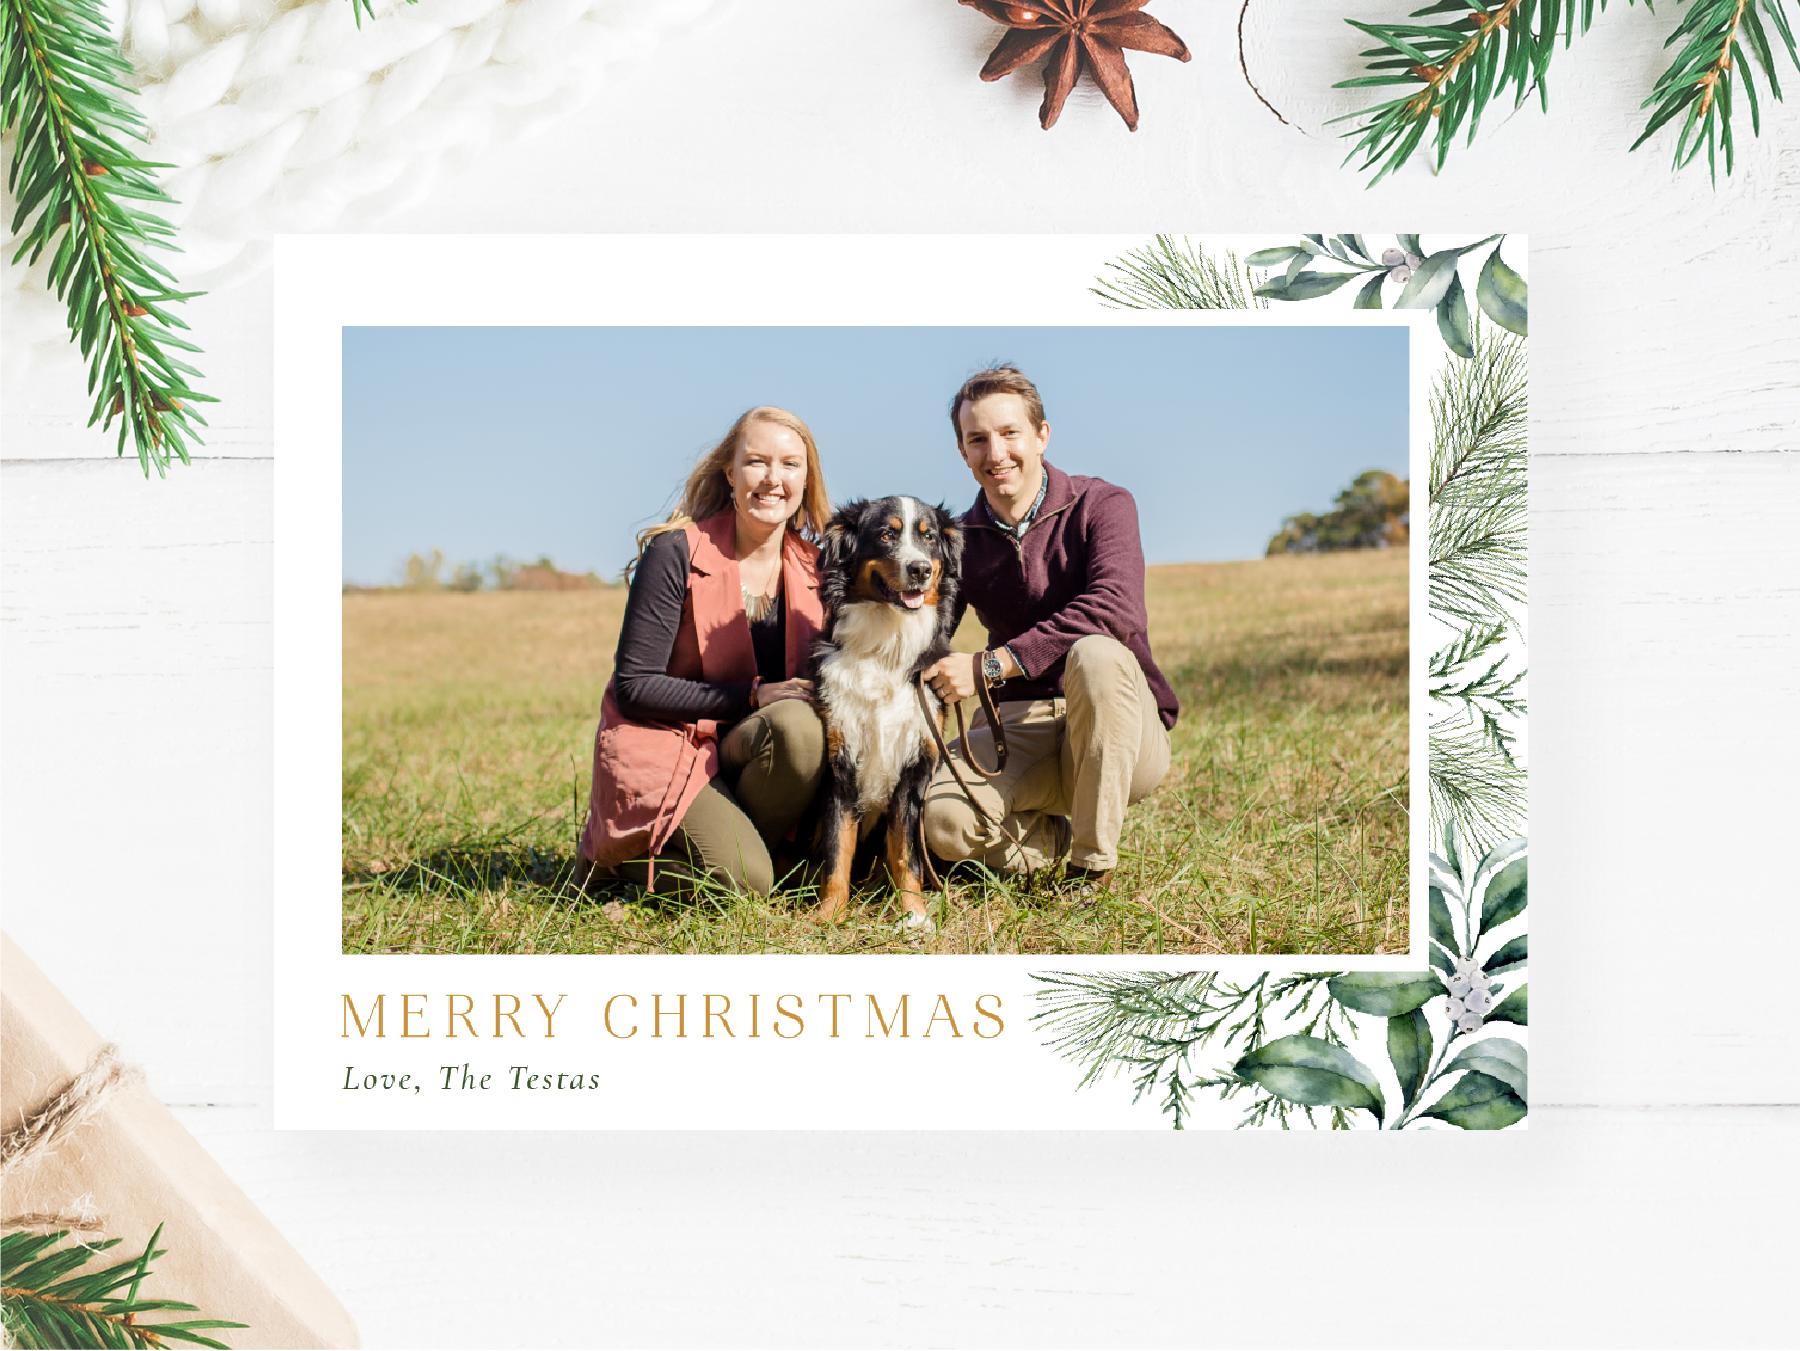 Photo-Christmas-holiday-card-01.png